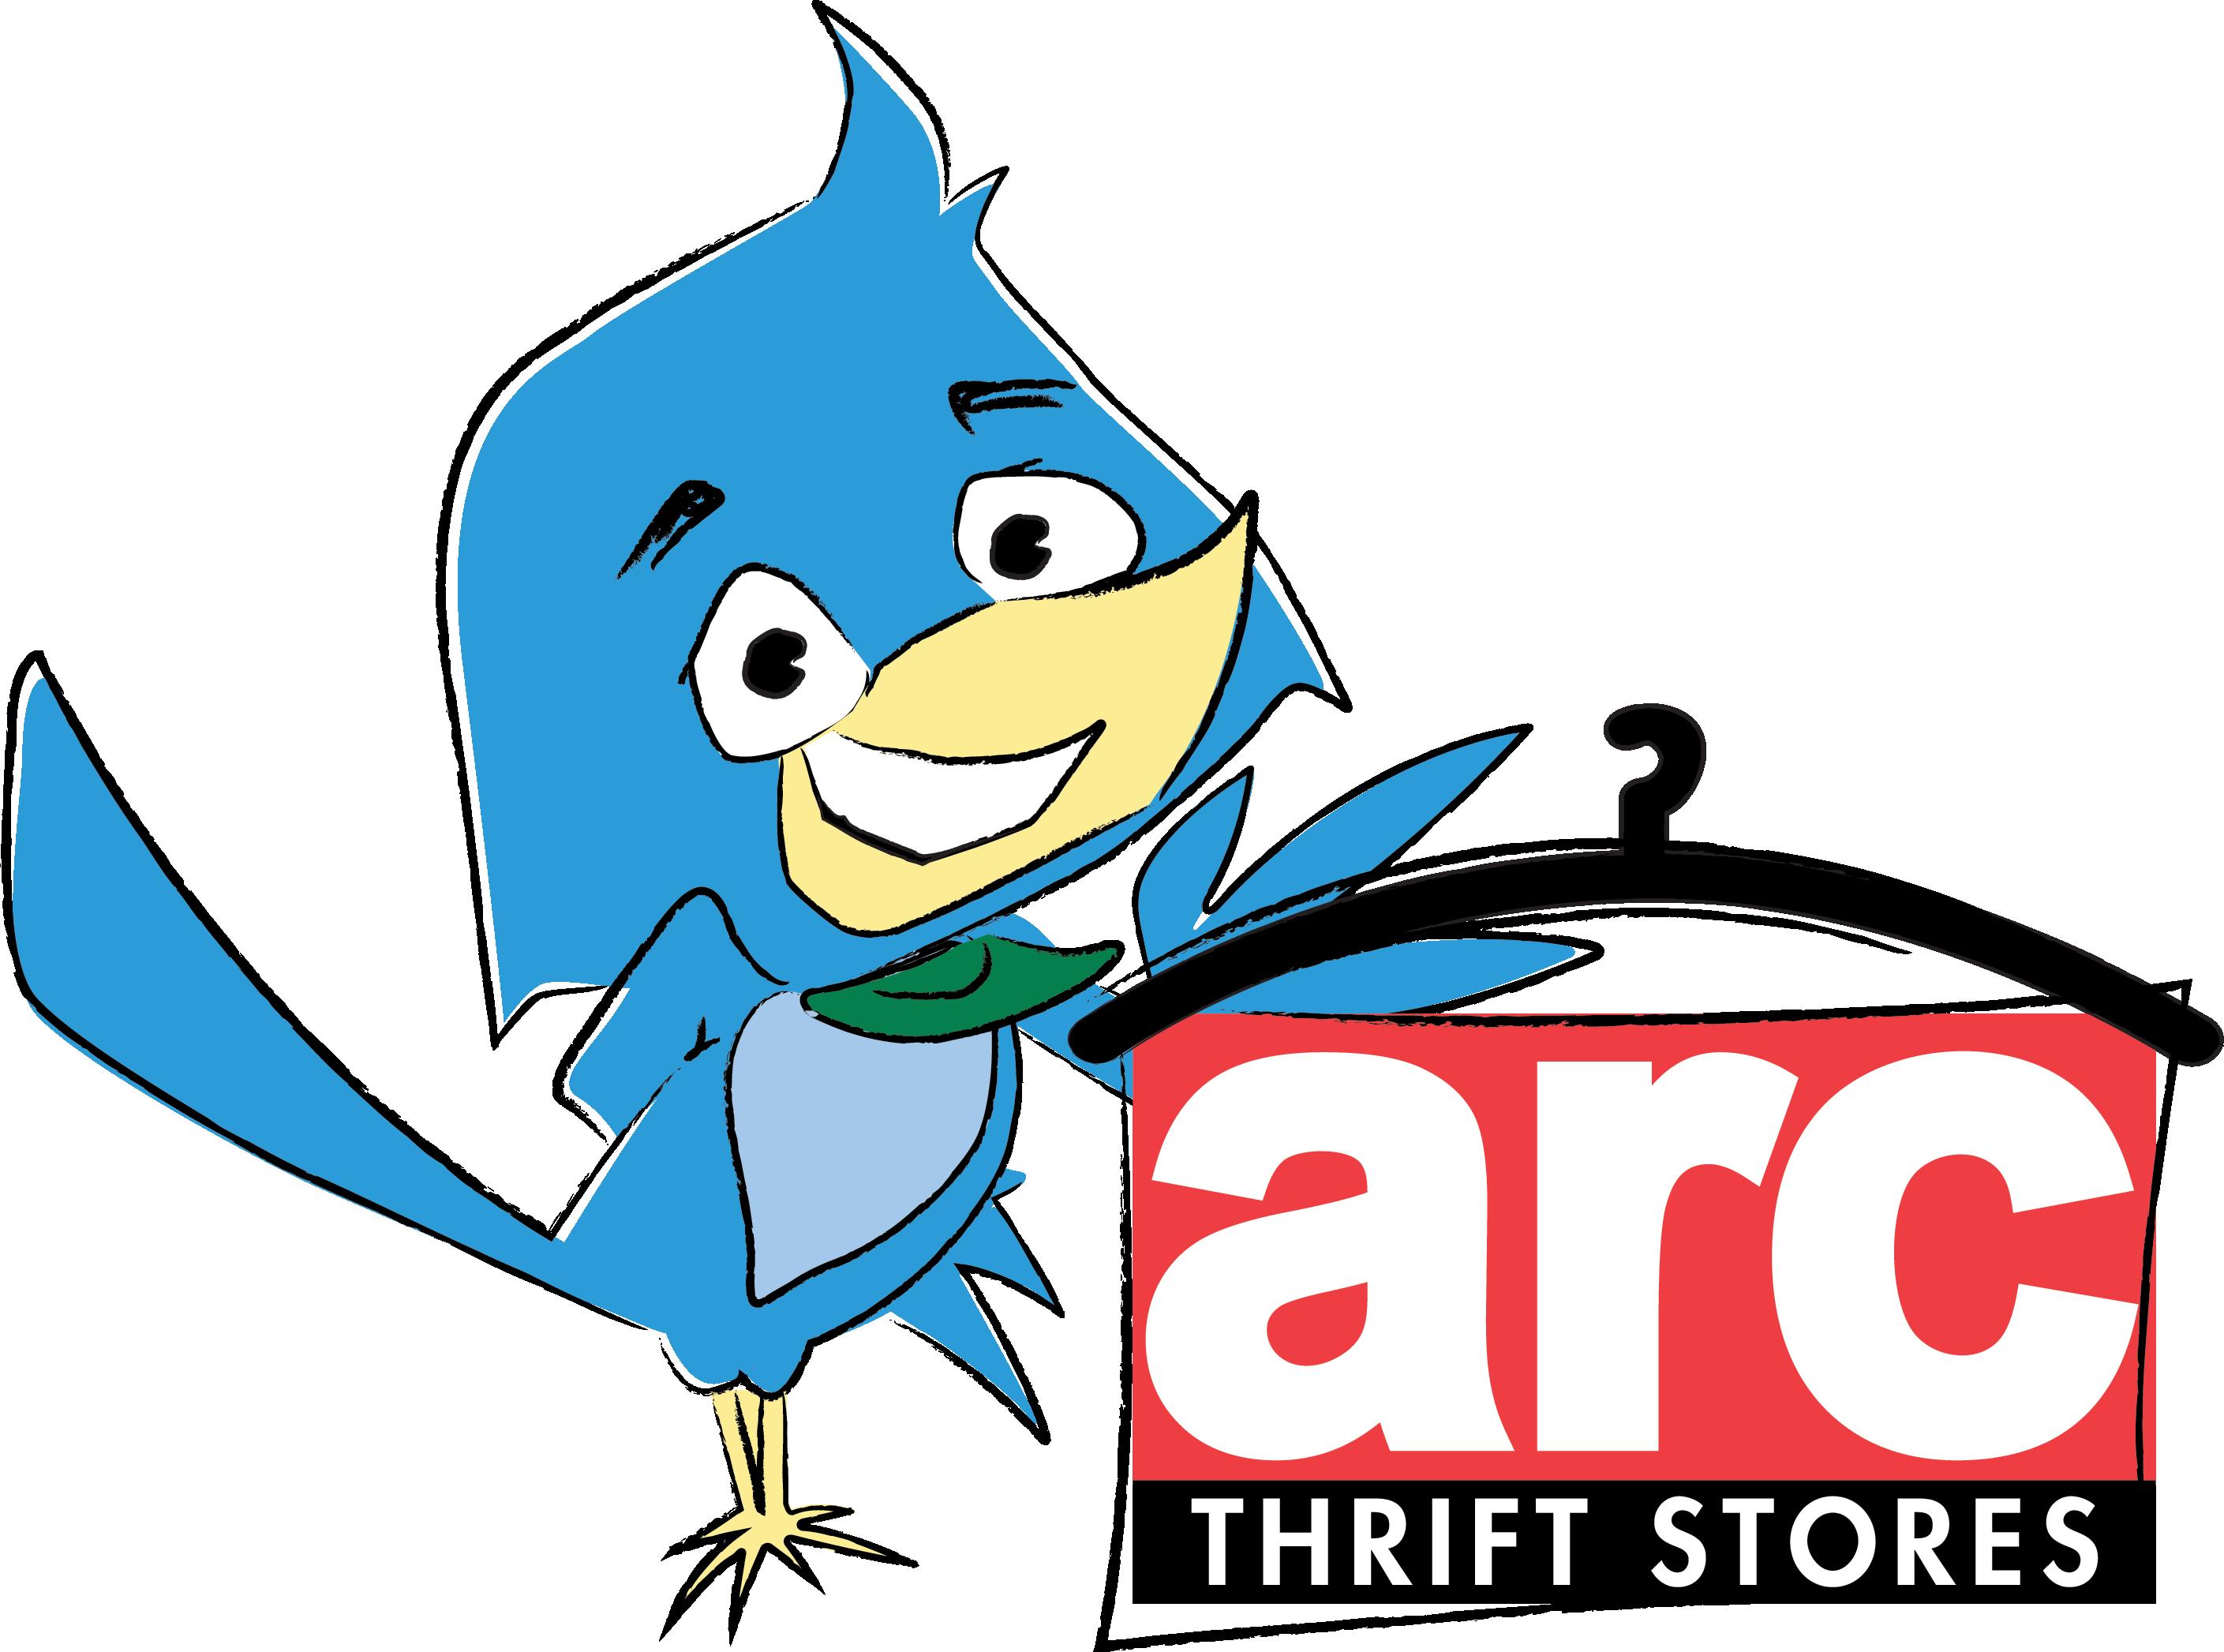 Arc Thrift Store Logo